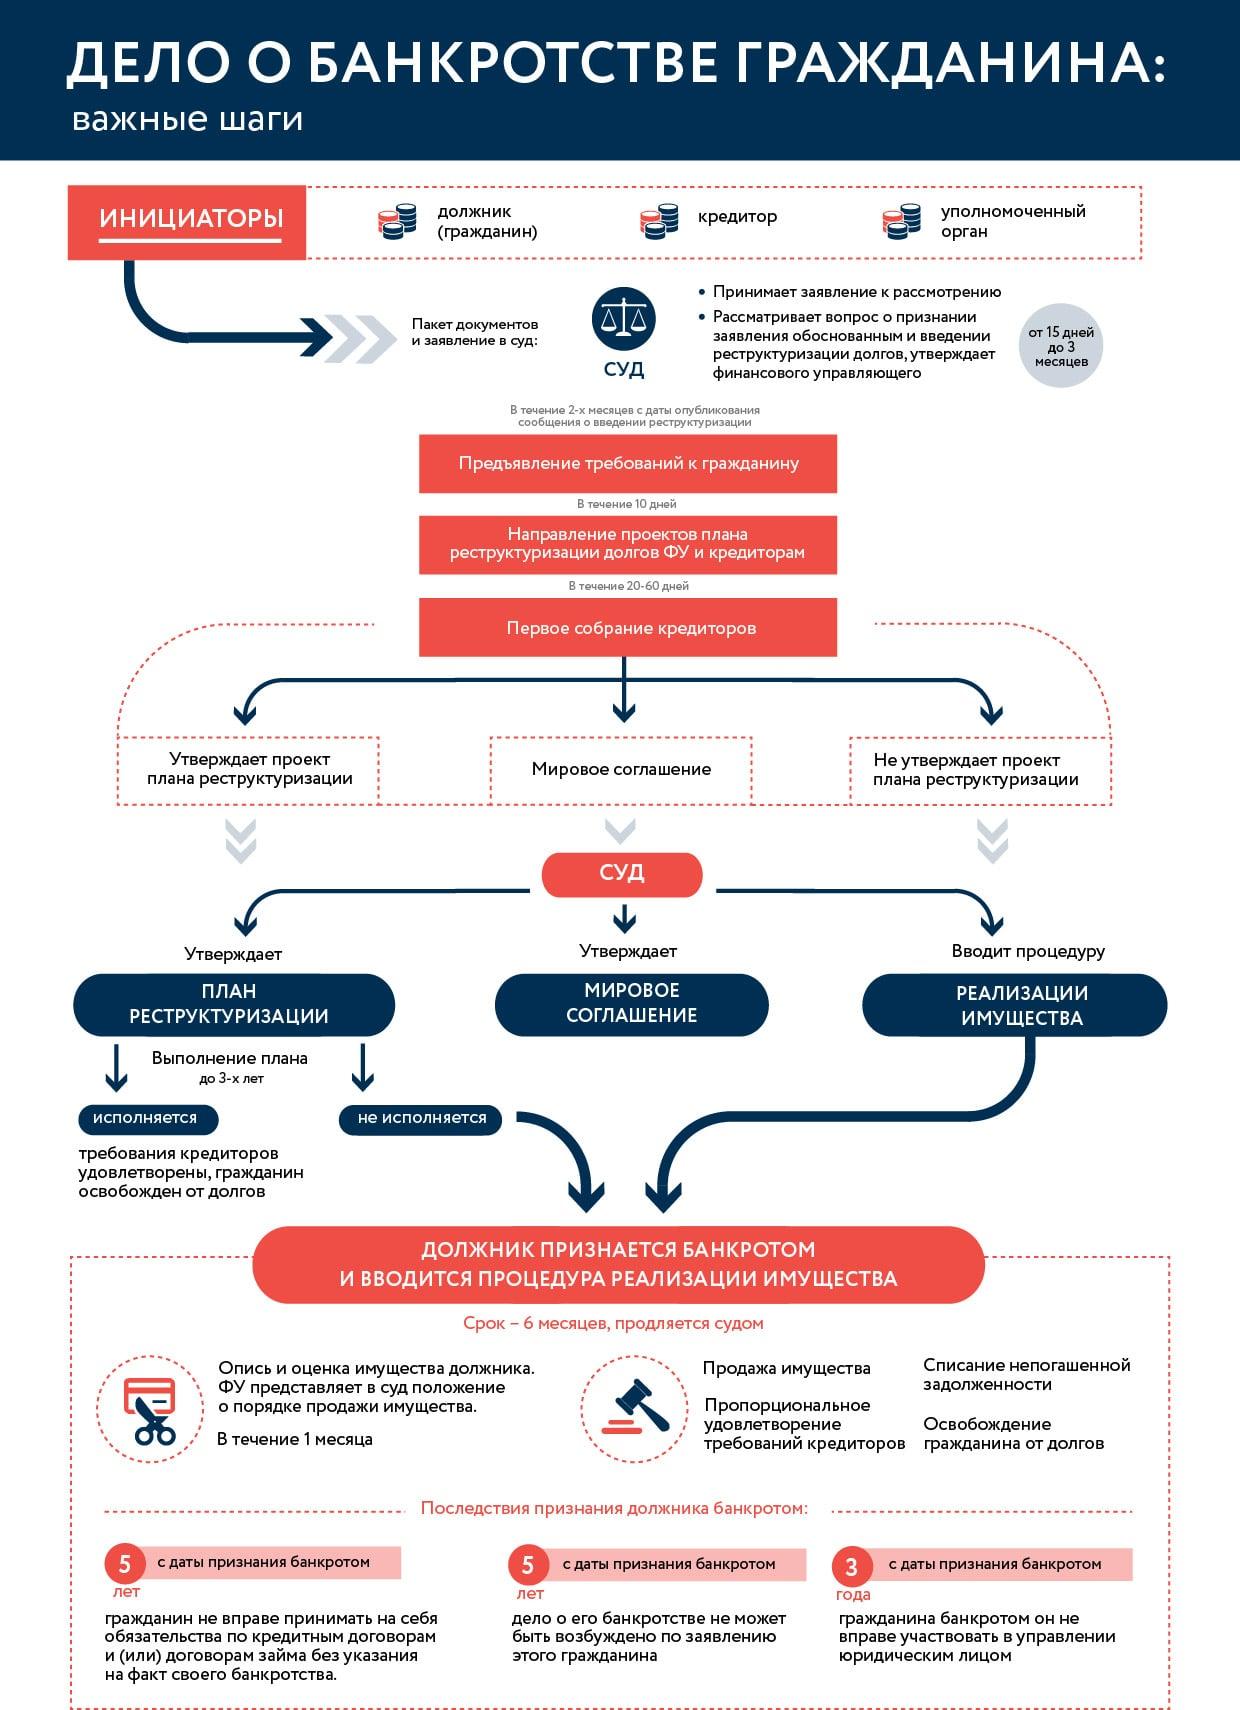 Схема банкротства гражданина